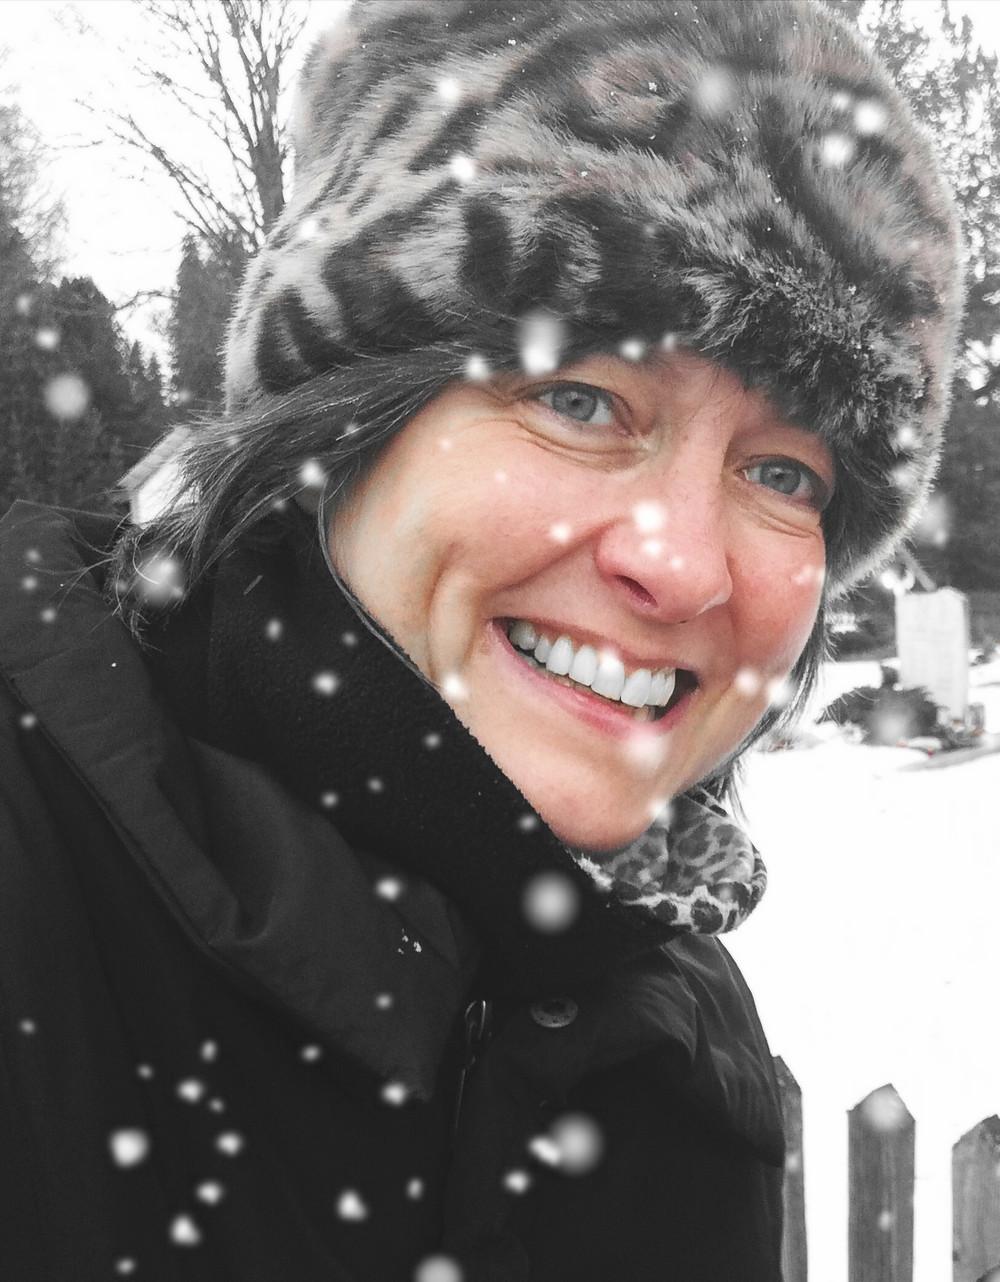 Author Amelia Marriette walking on Christmas Eve in Austria. photo credit Katie Gayle